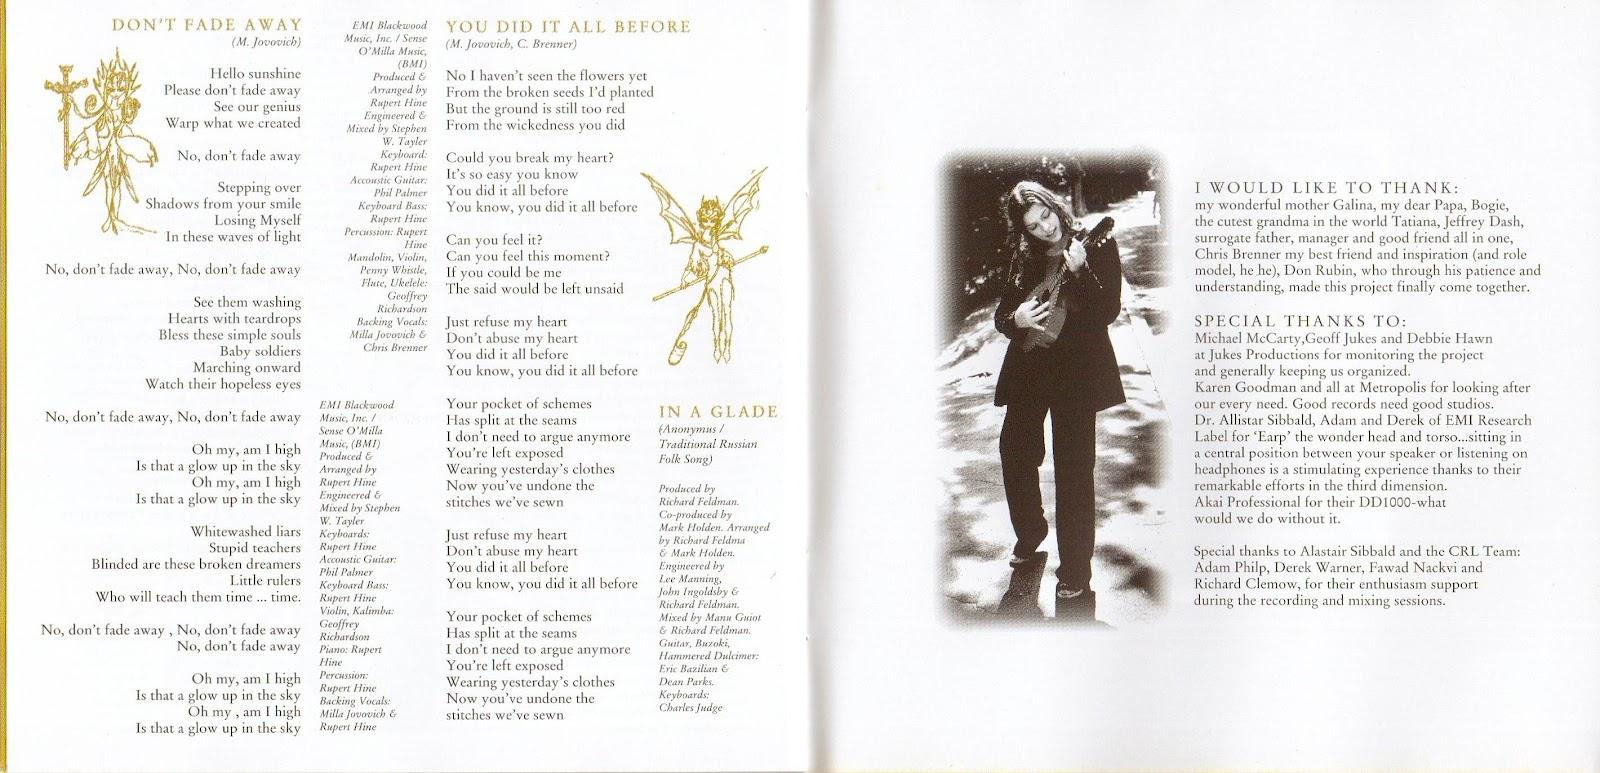 http://4.bp.blogspot.com/-aULA8vfOGNI/T9RfkuvkdSI/AAAAAAAAAo4/M5LDLSUaAY0/s1600/6-CD+The+Divine+Comedy+-+Milla.jpg